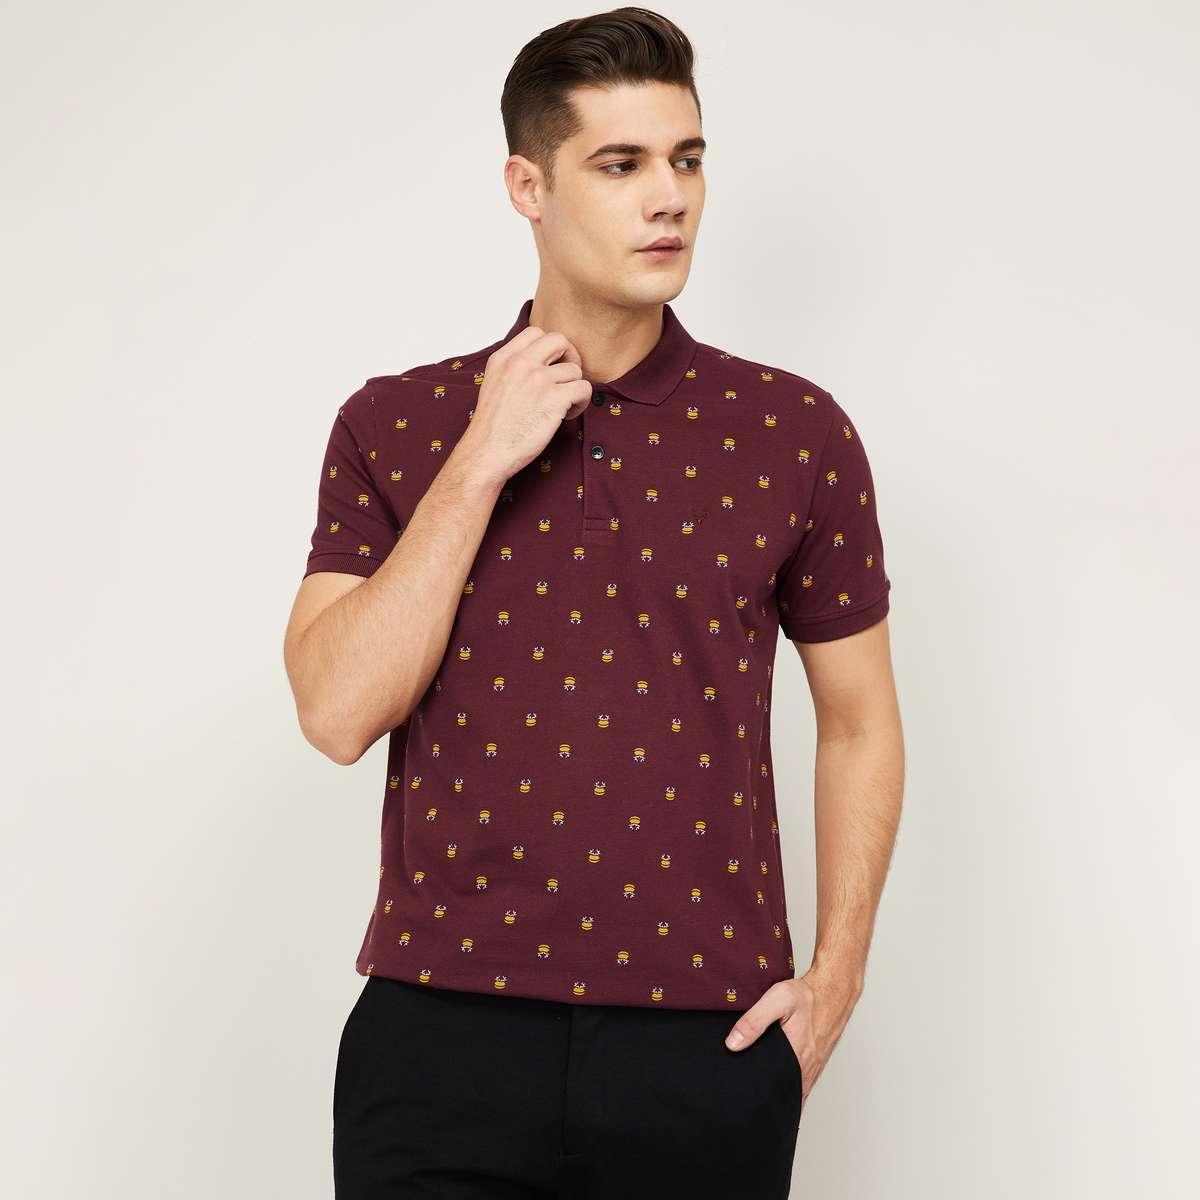 ALLEN SOLLY Men Printed Smart Casual Polo T-shirt